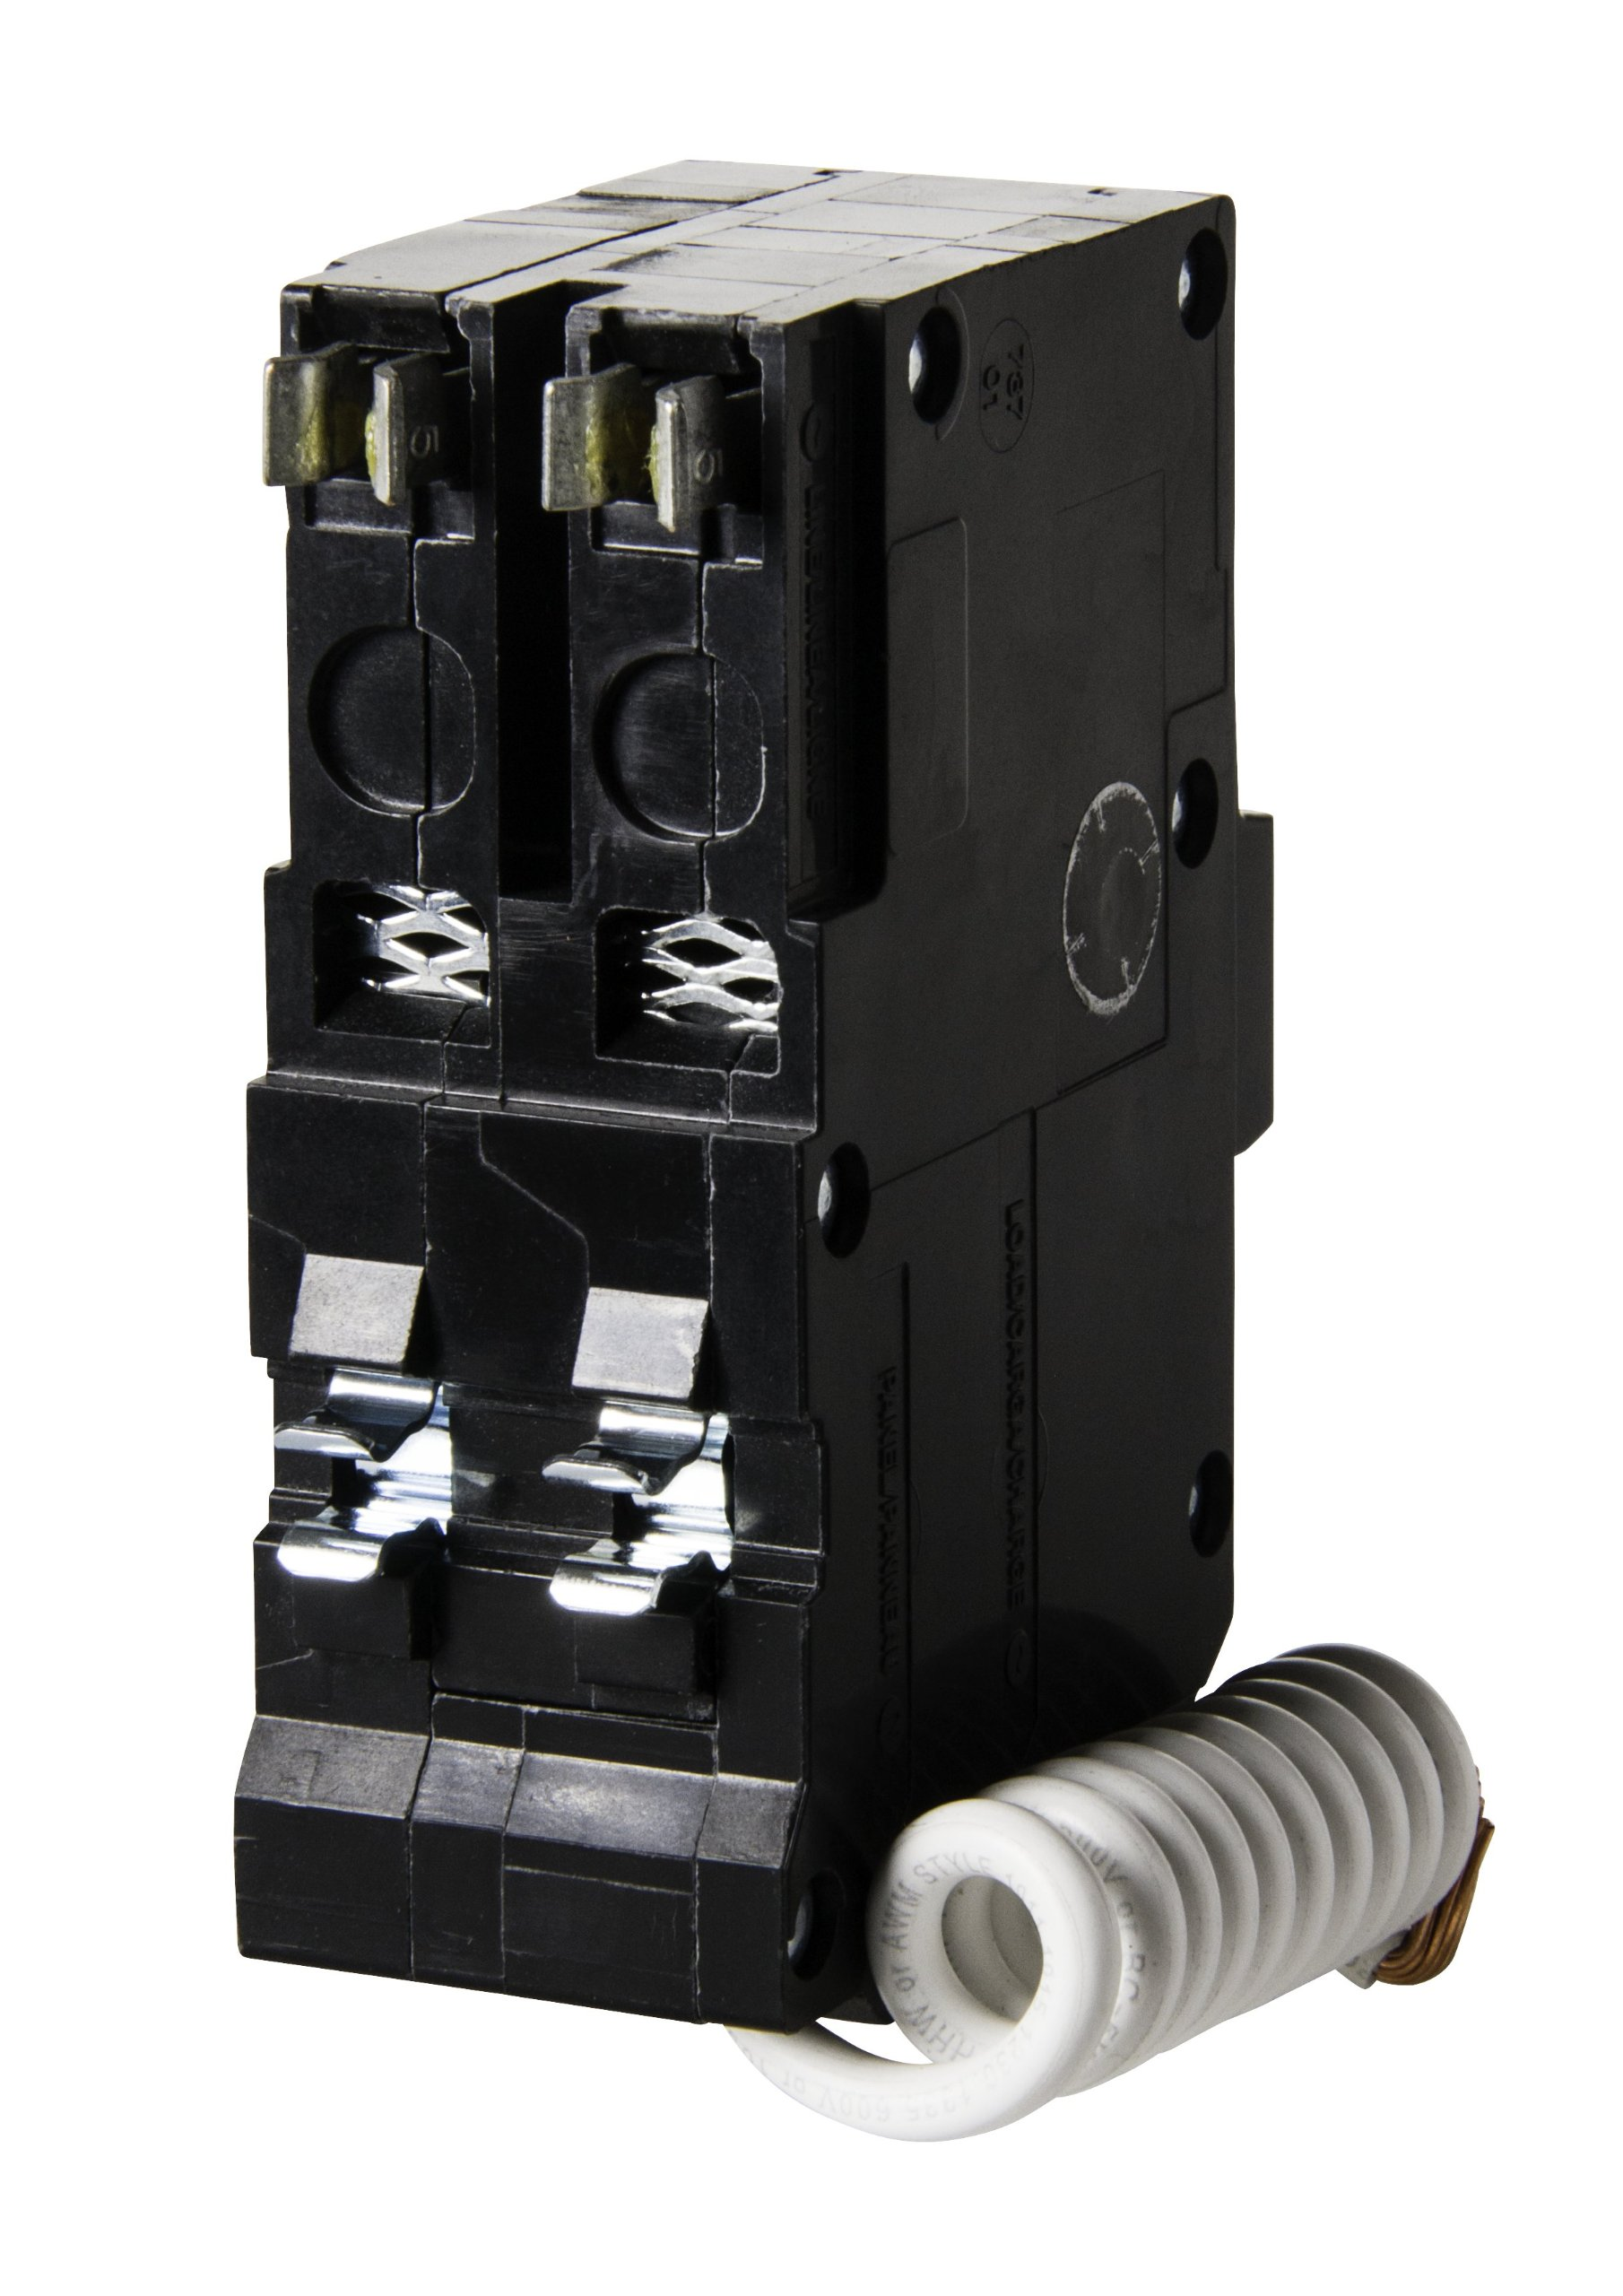 Square D by Schneider Electric QO240GFICP QO 40-Amp Two-Pole GFCI Breaker by Square D by Schneider Electric (Image #5)